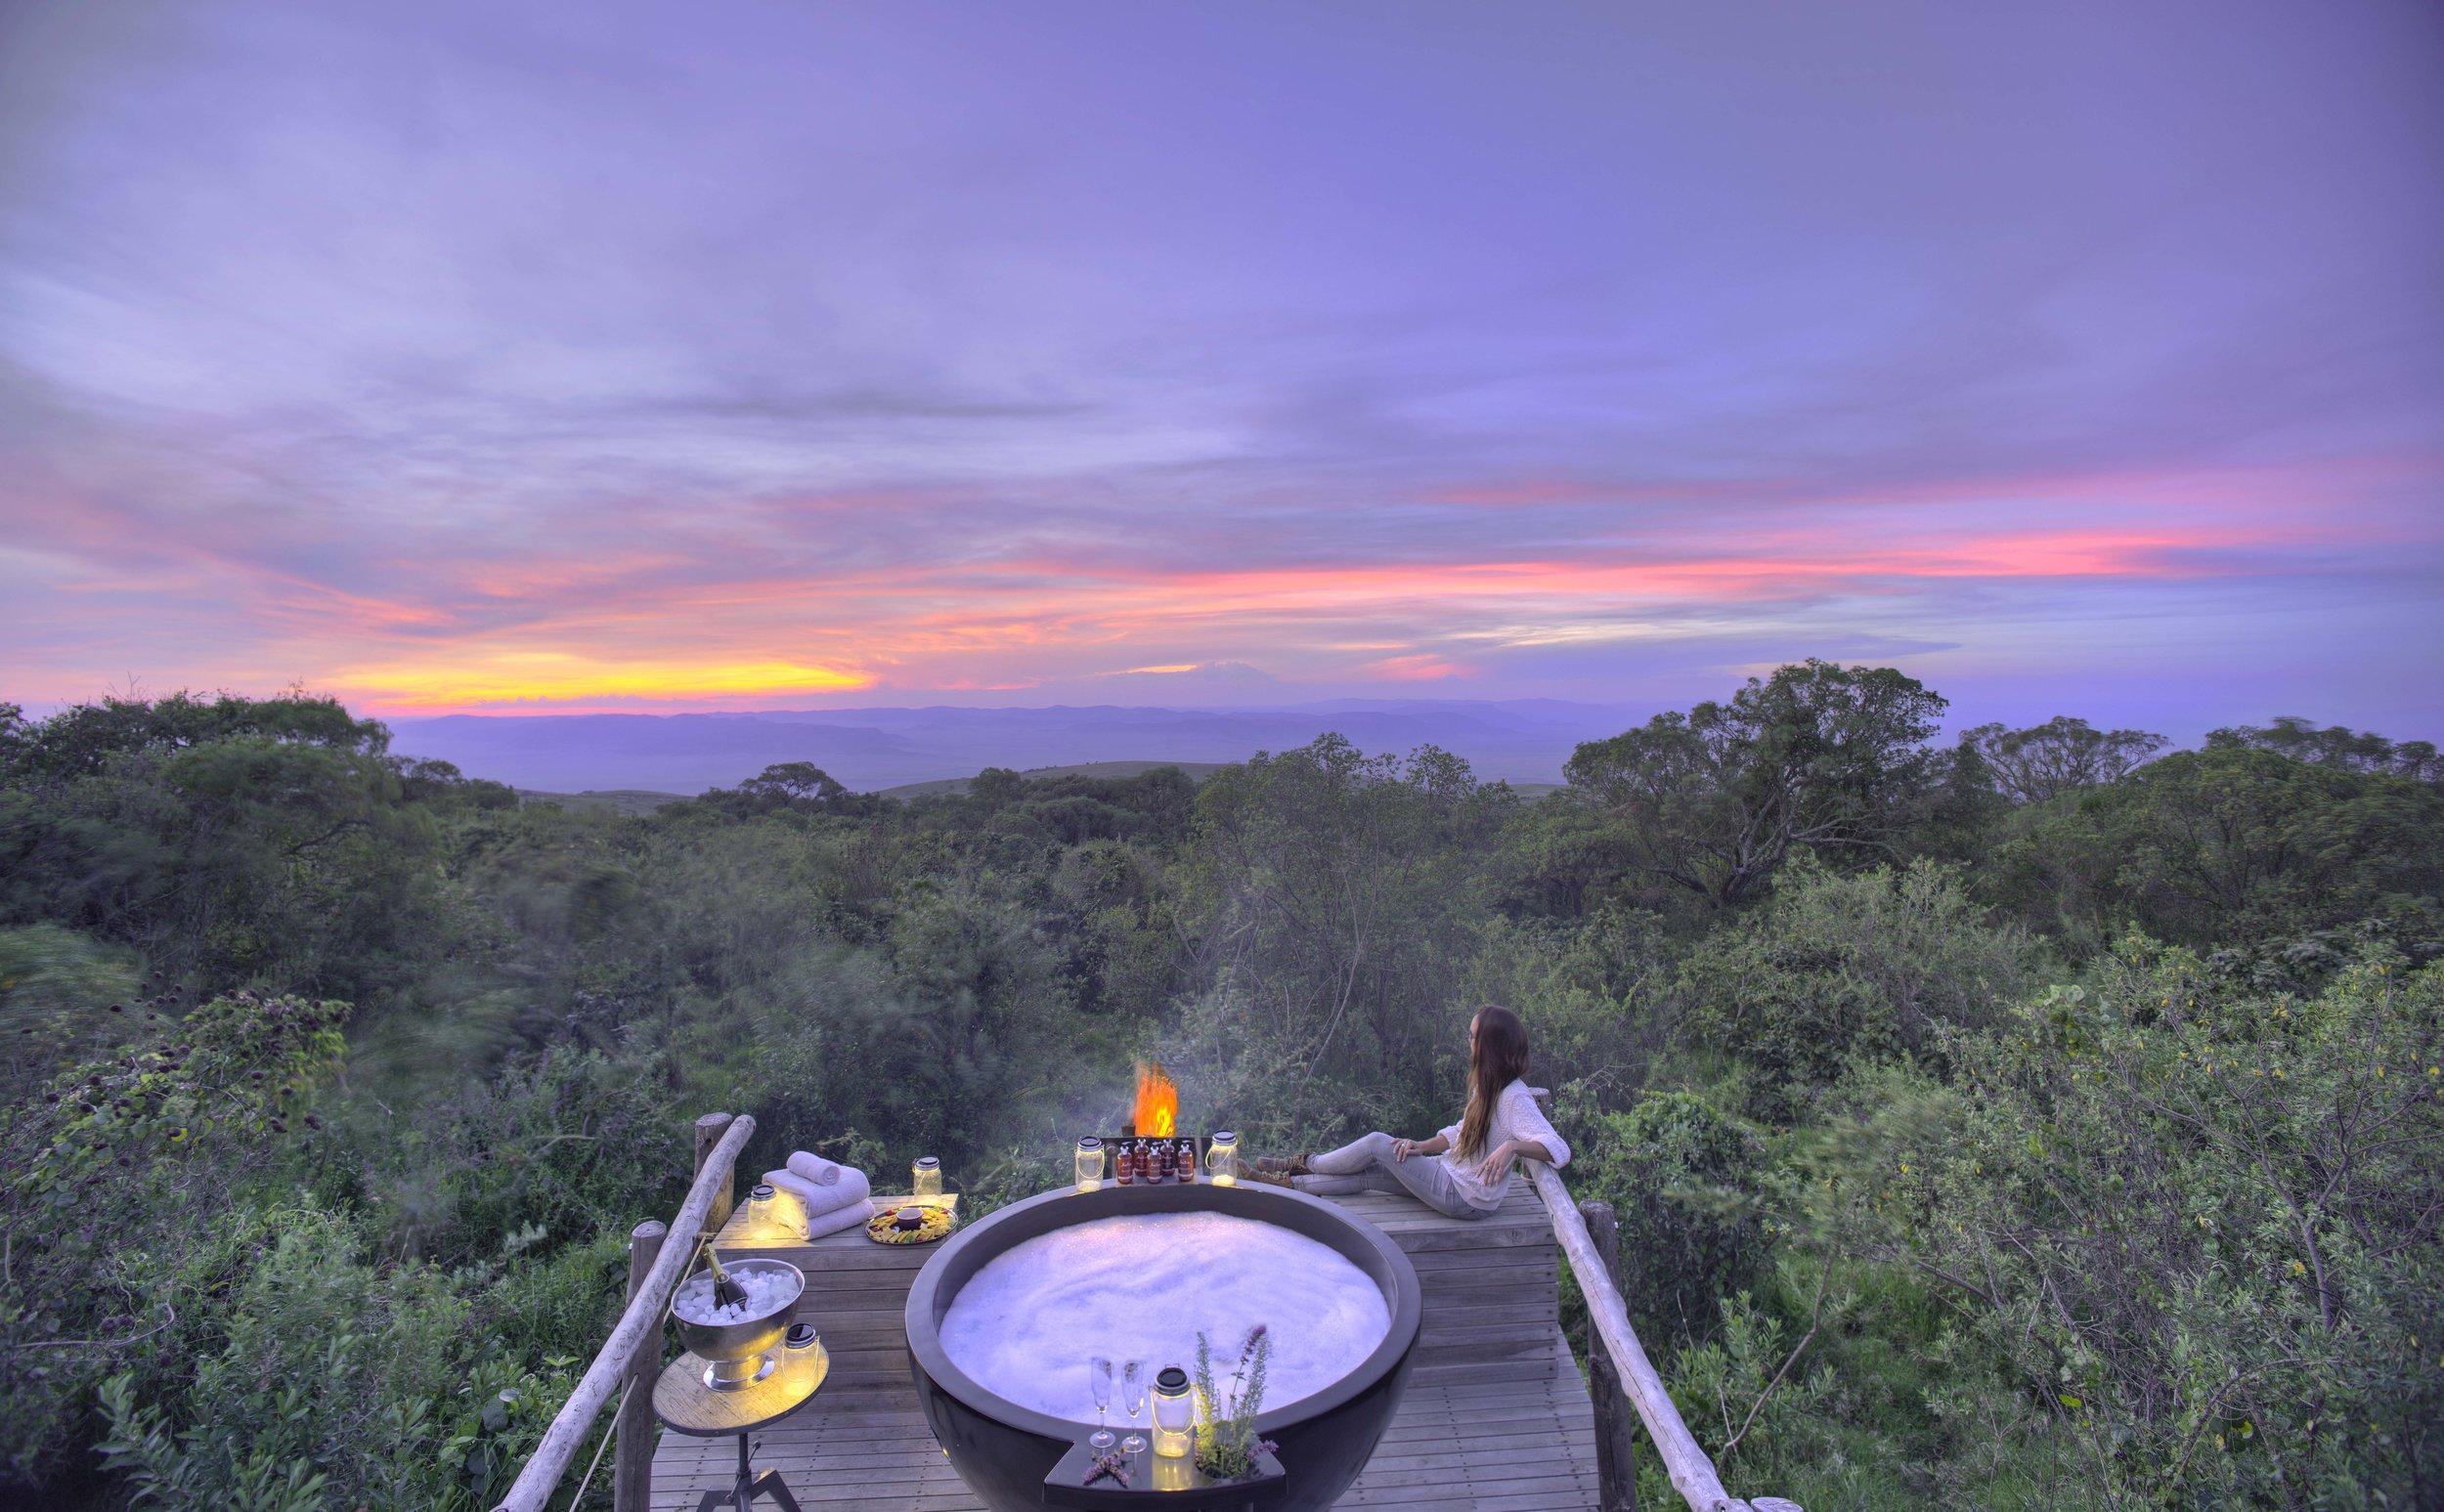 The-Highlands-honeymoon-hot-tub-sunset.jpg